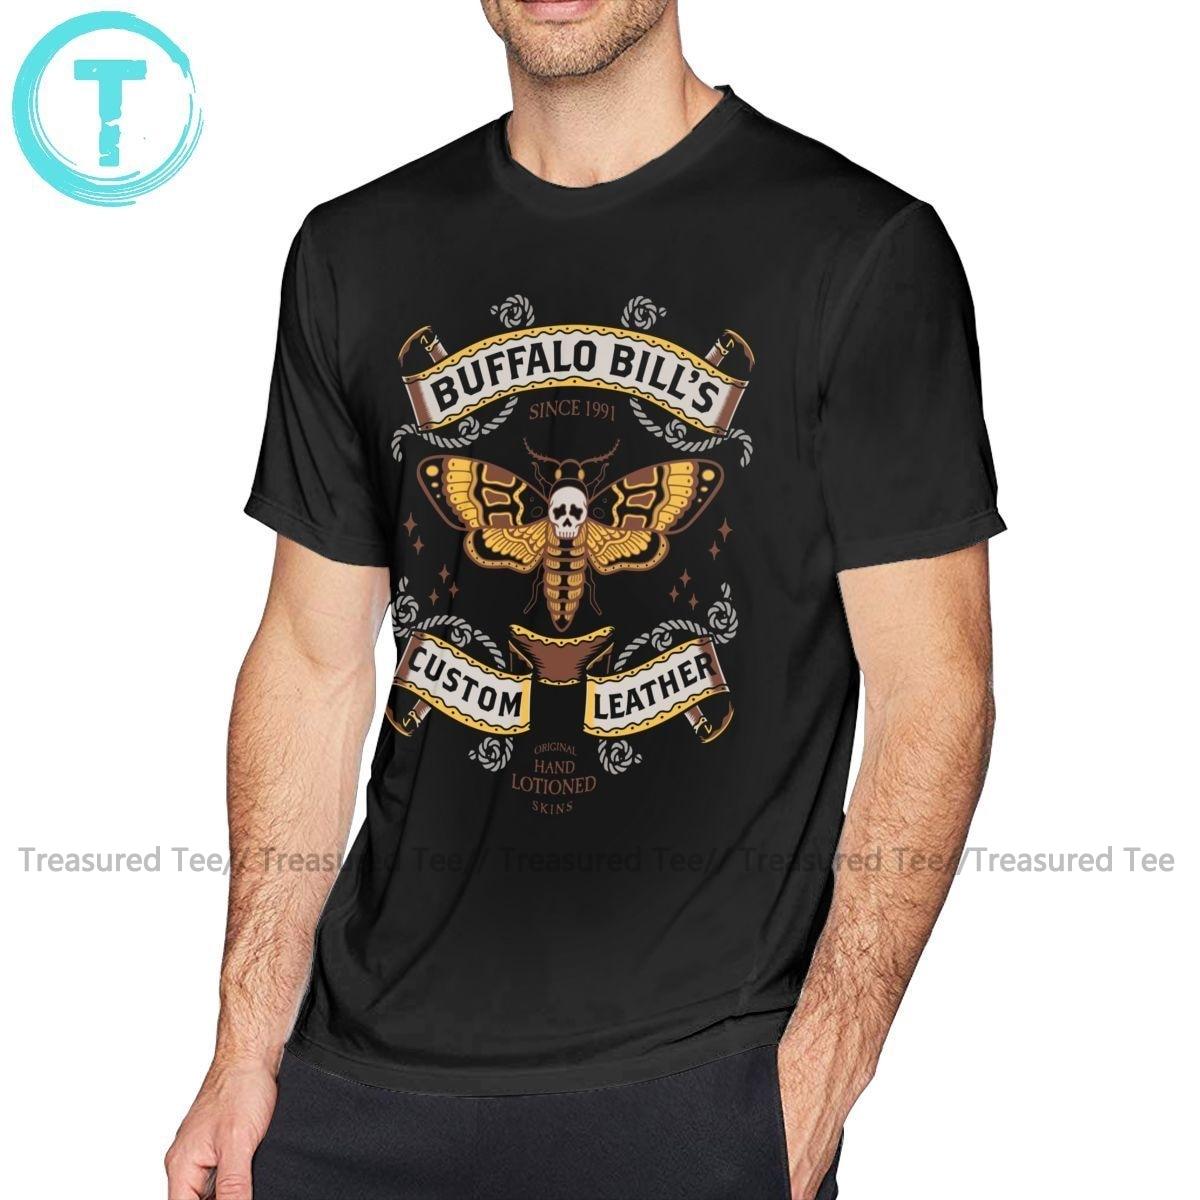 Camiseta con gráfico de cuero personalizado de Buffalo Bill de Silence Of The Lambs 5x, camiseta divertida para hombre